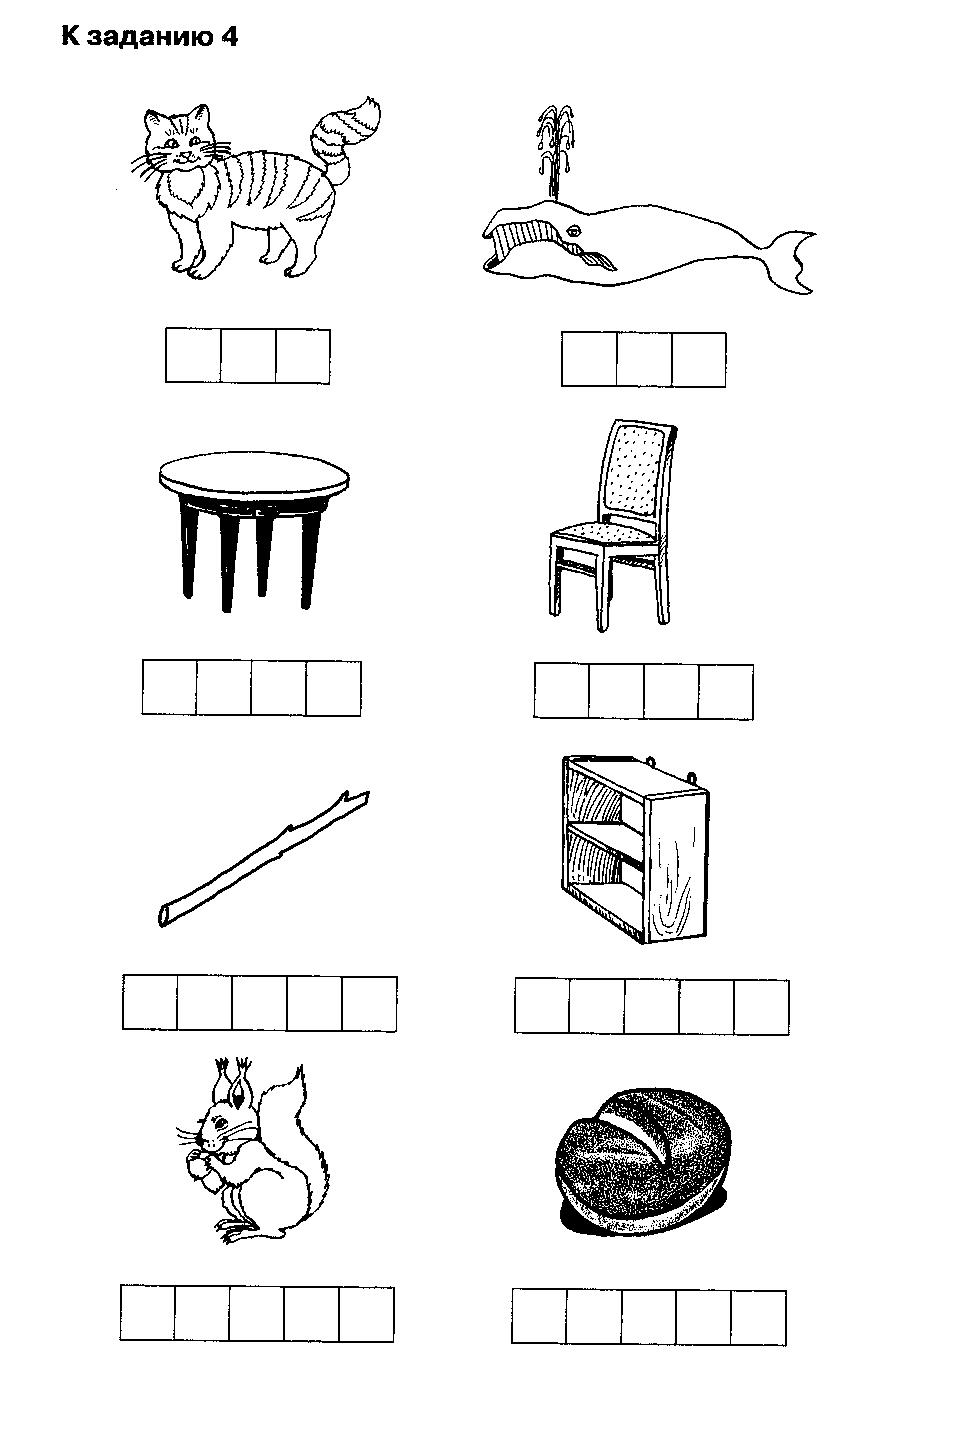 интересно, картинка и схема звукового пост